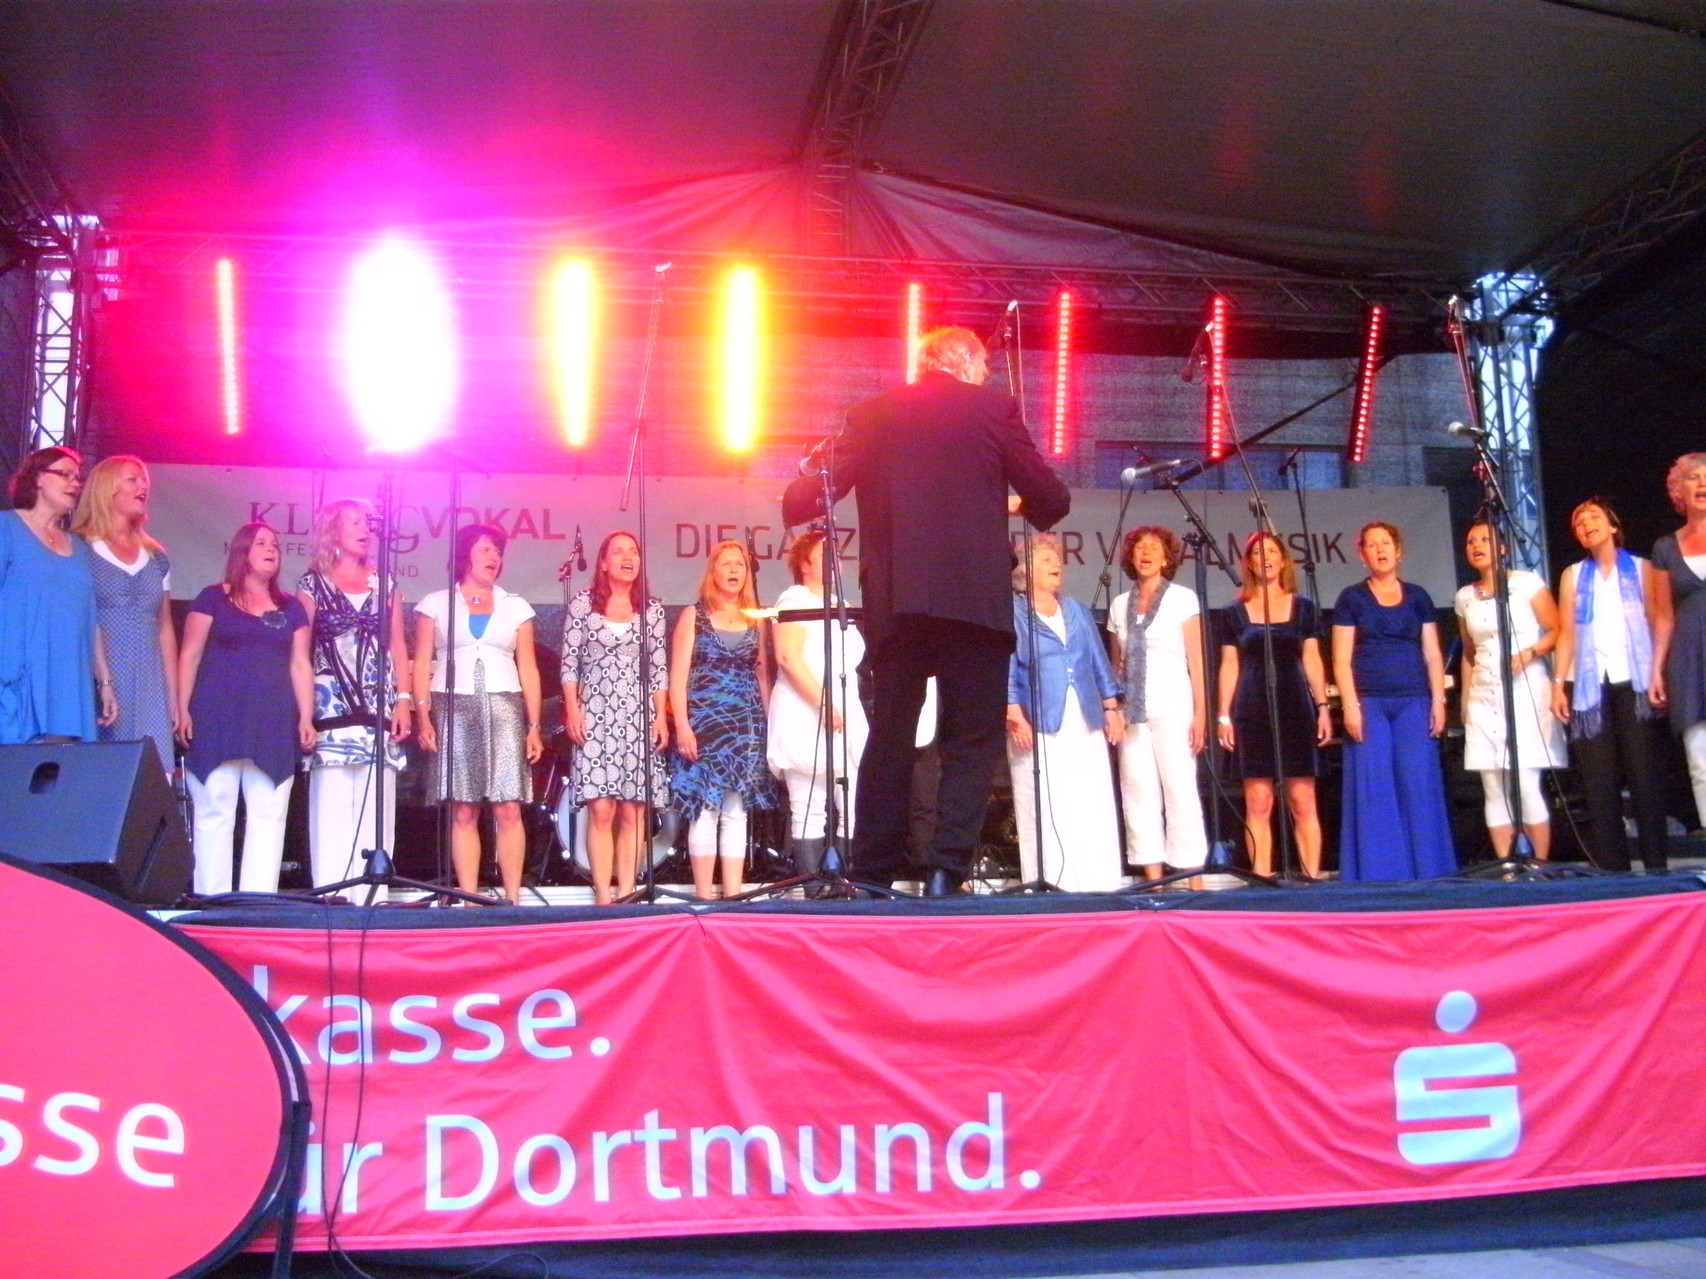 Klangvokal Musikfestival, Dortmund, juni 2010